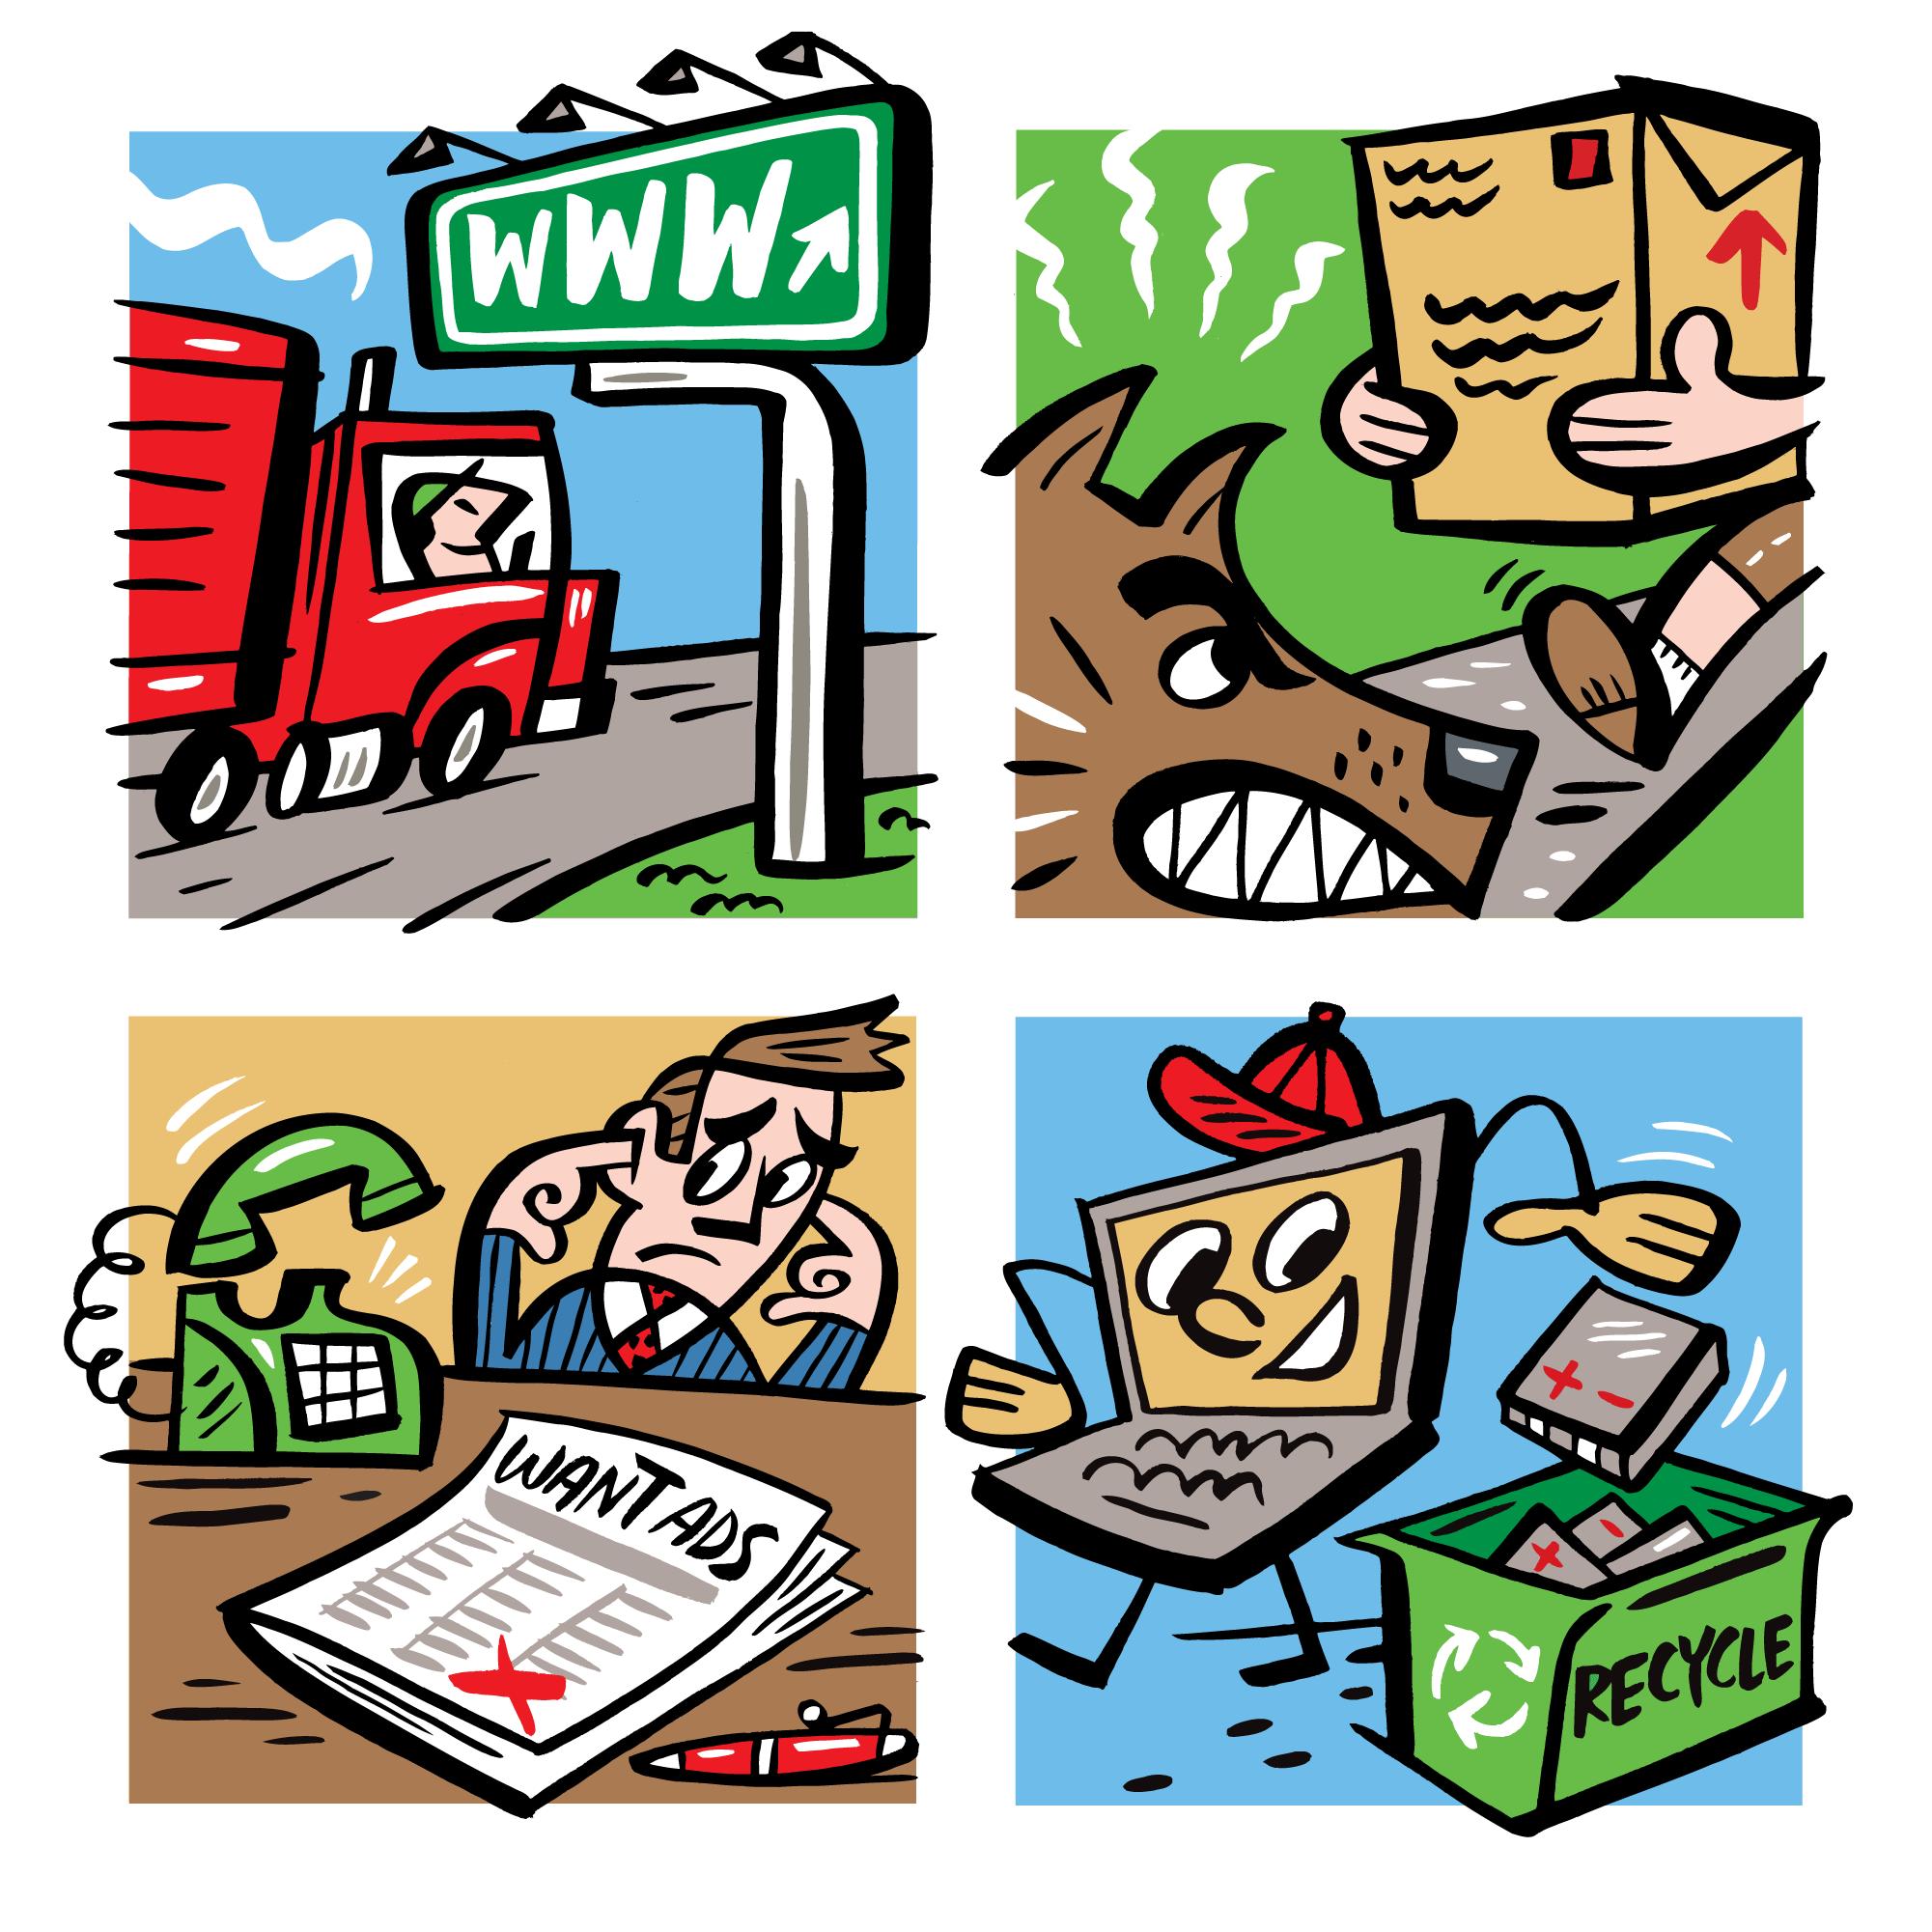 Spot Illustrations: Wall Street Journal